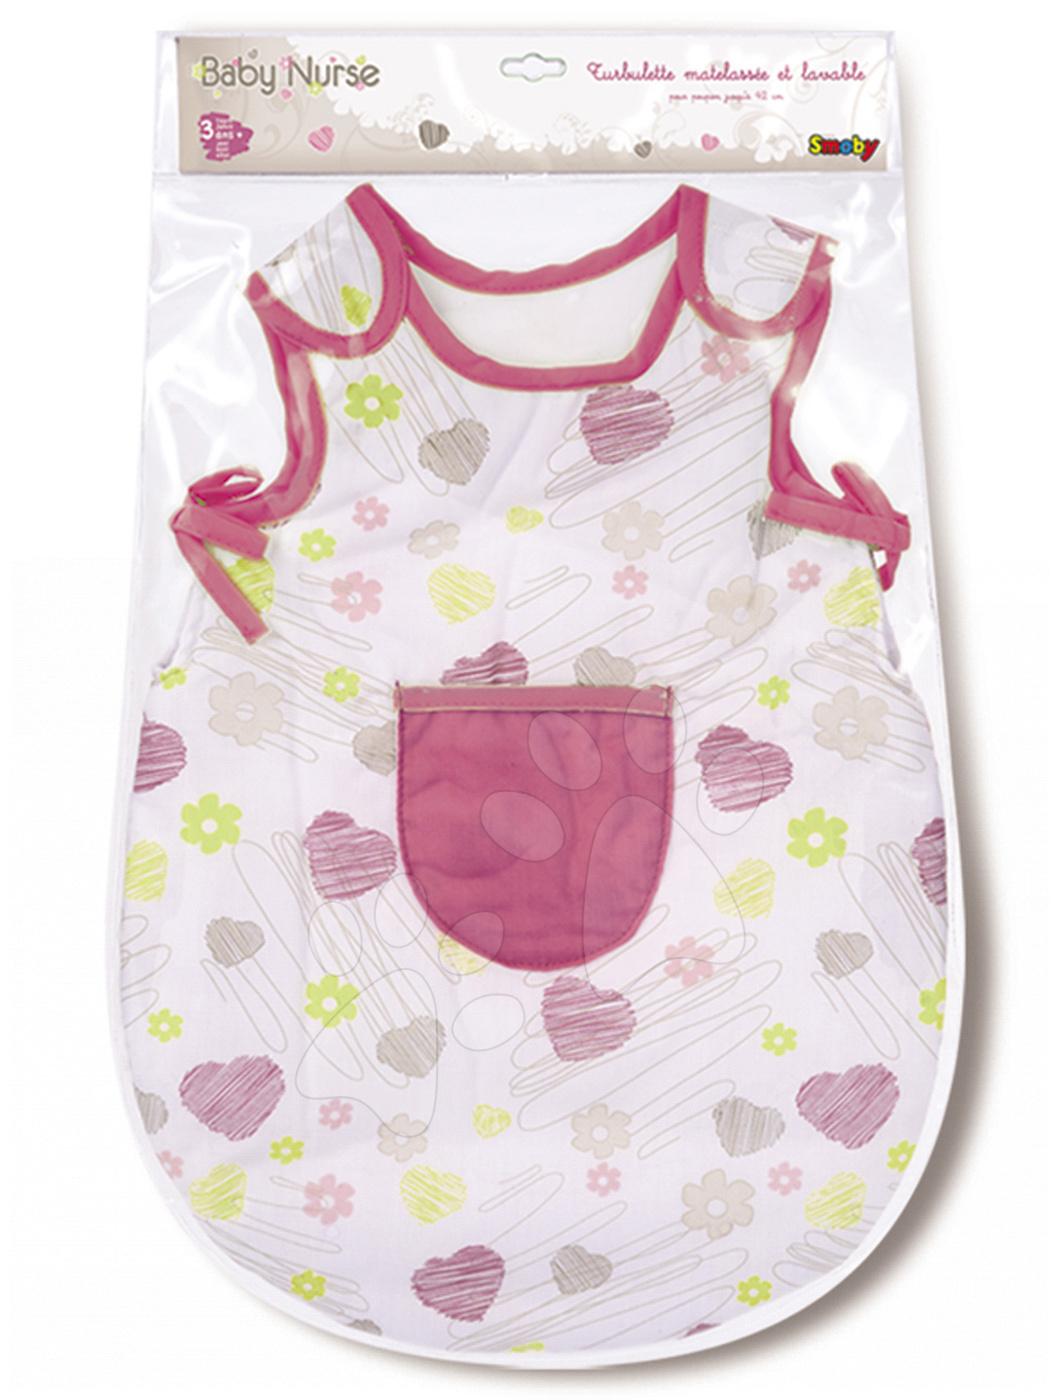 Pizsama játékbabának 42 cm Baby Nurse Smoby